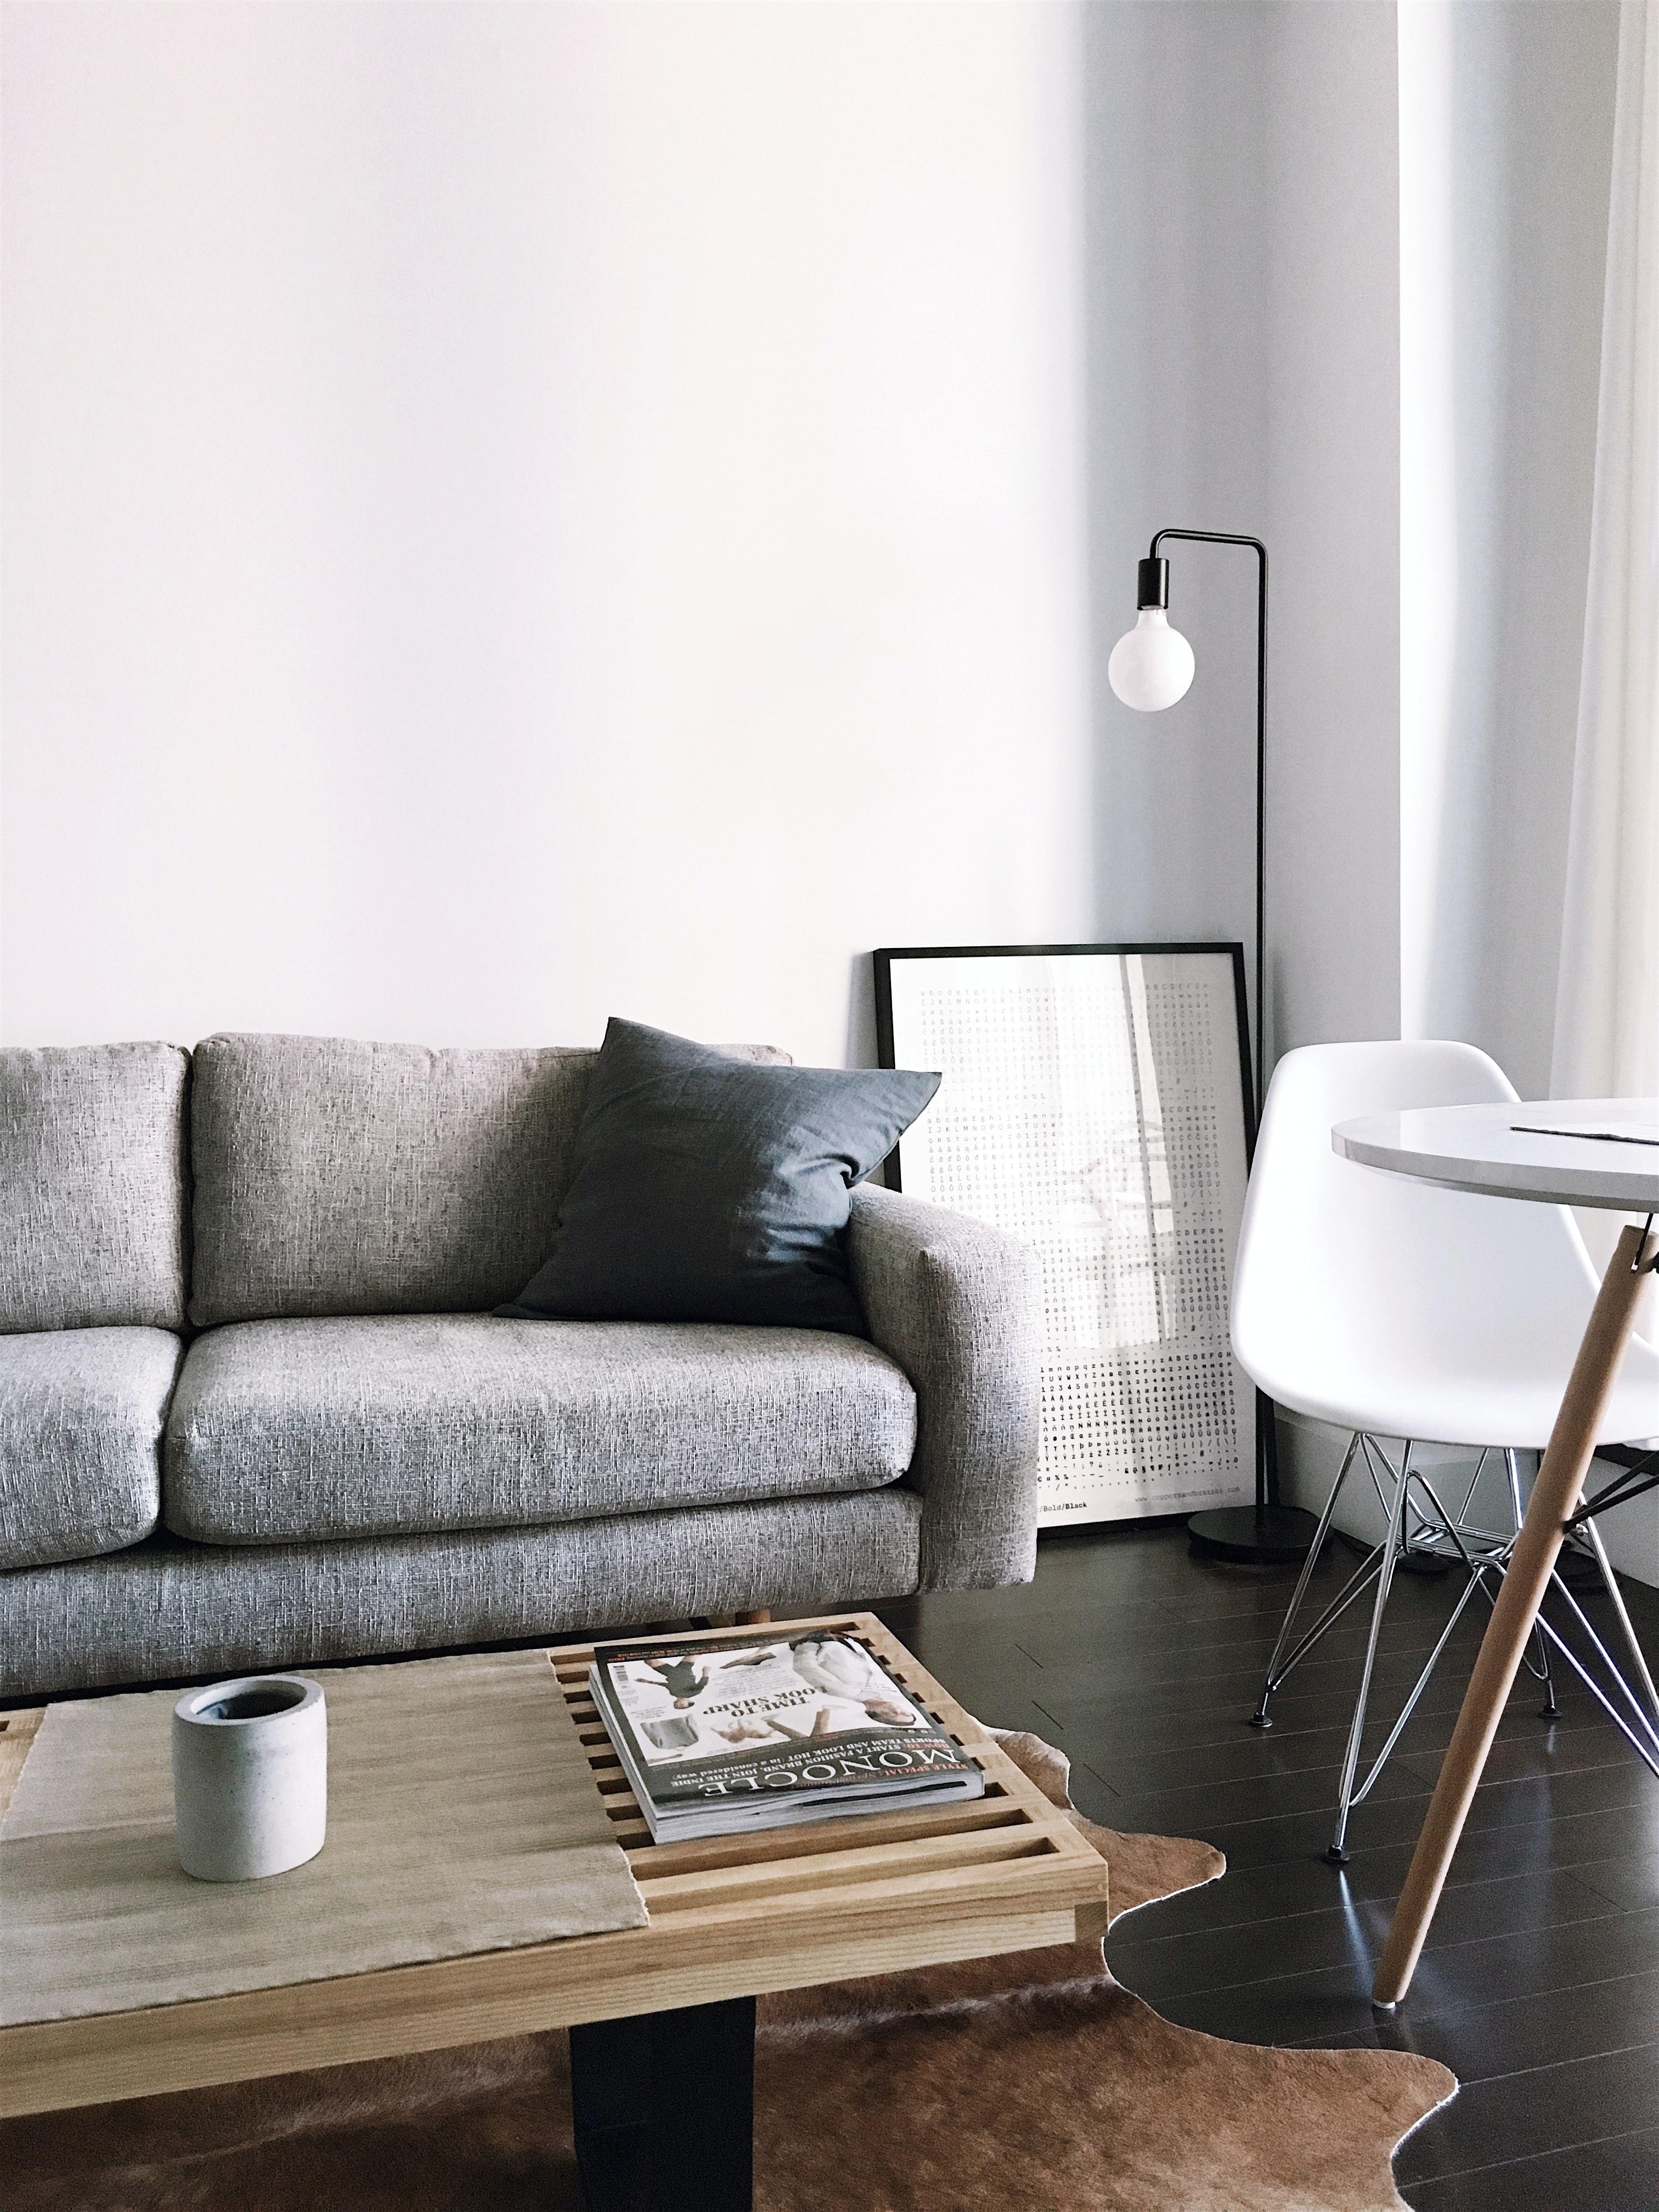 Interior design pictures [hd] | download free images on unsplash.